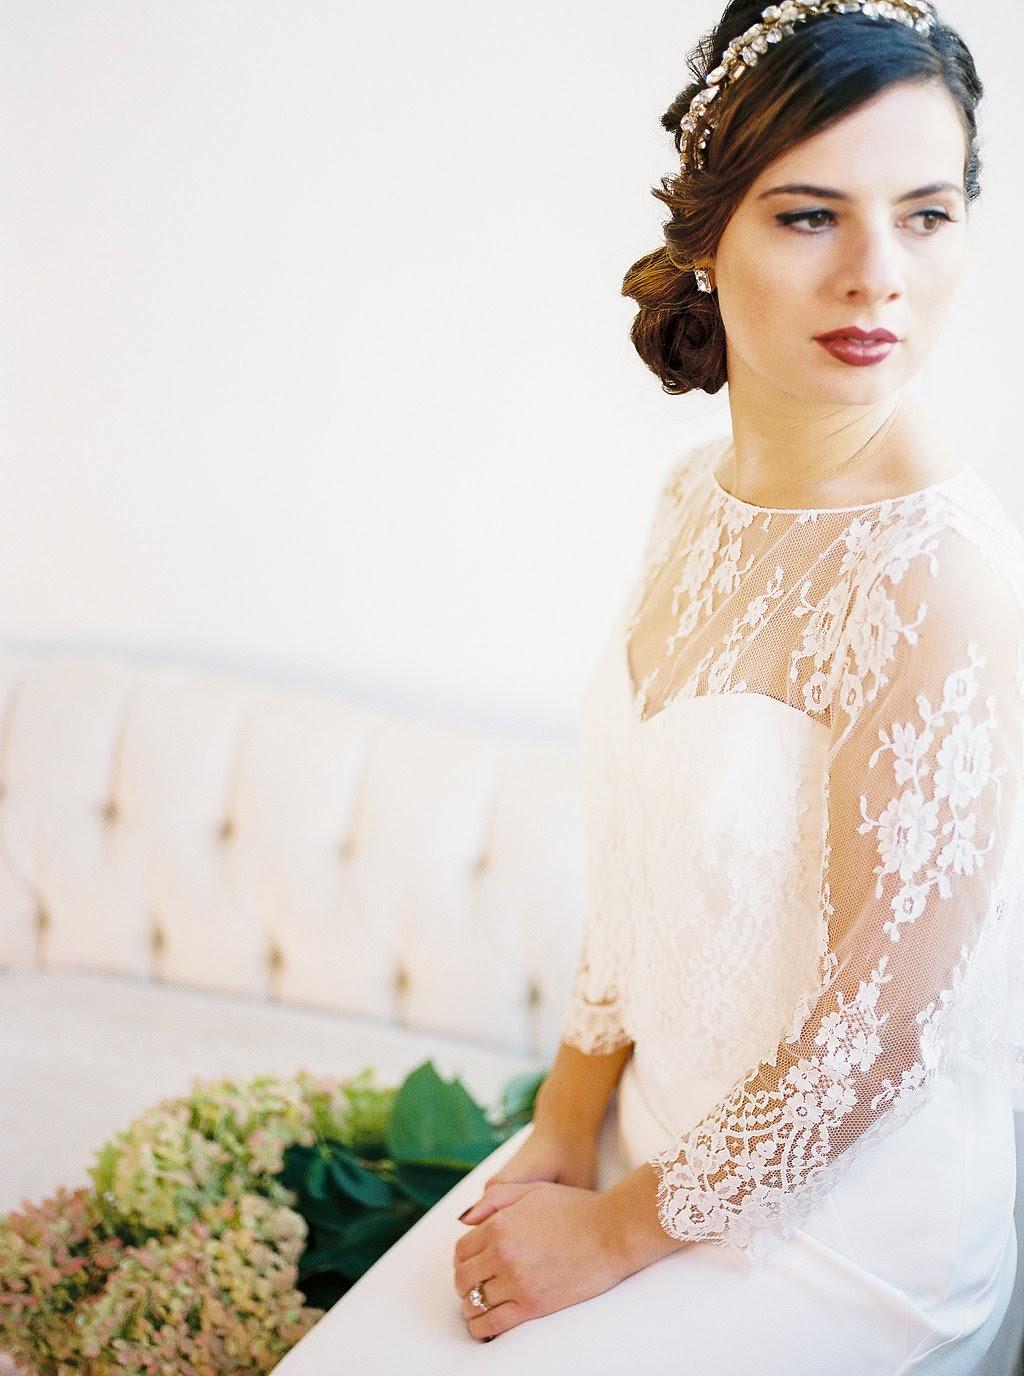 Alexandra-Elise-Photography-Ali-Reed-Film-Wedding-Photographer-111.jpg